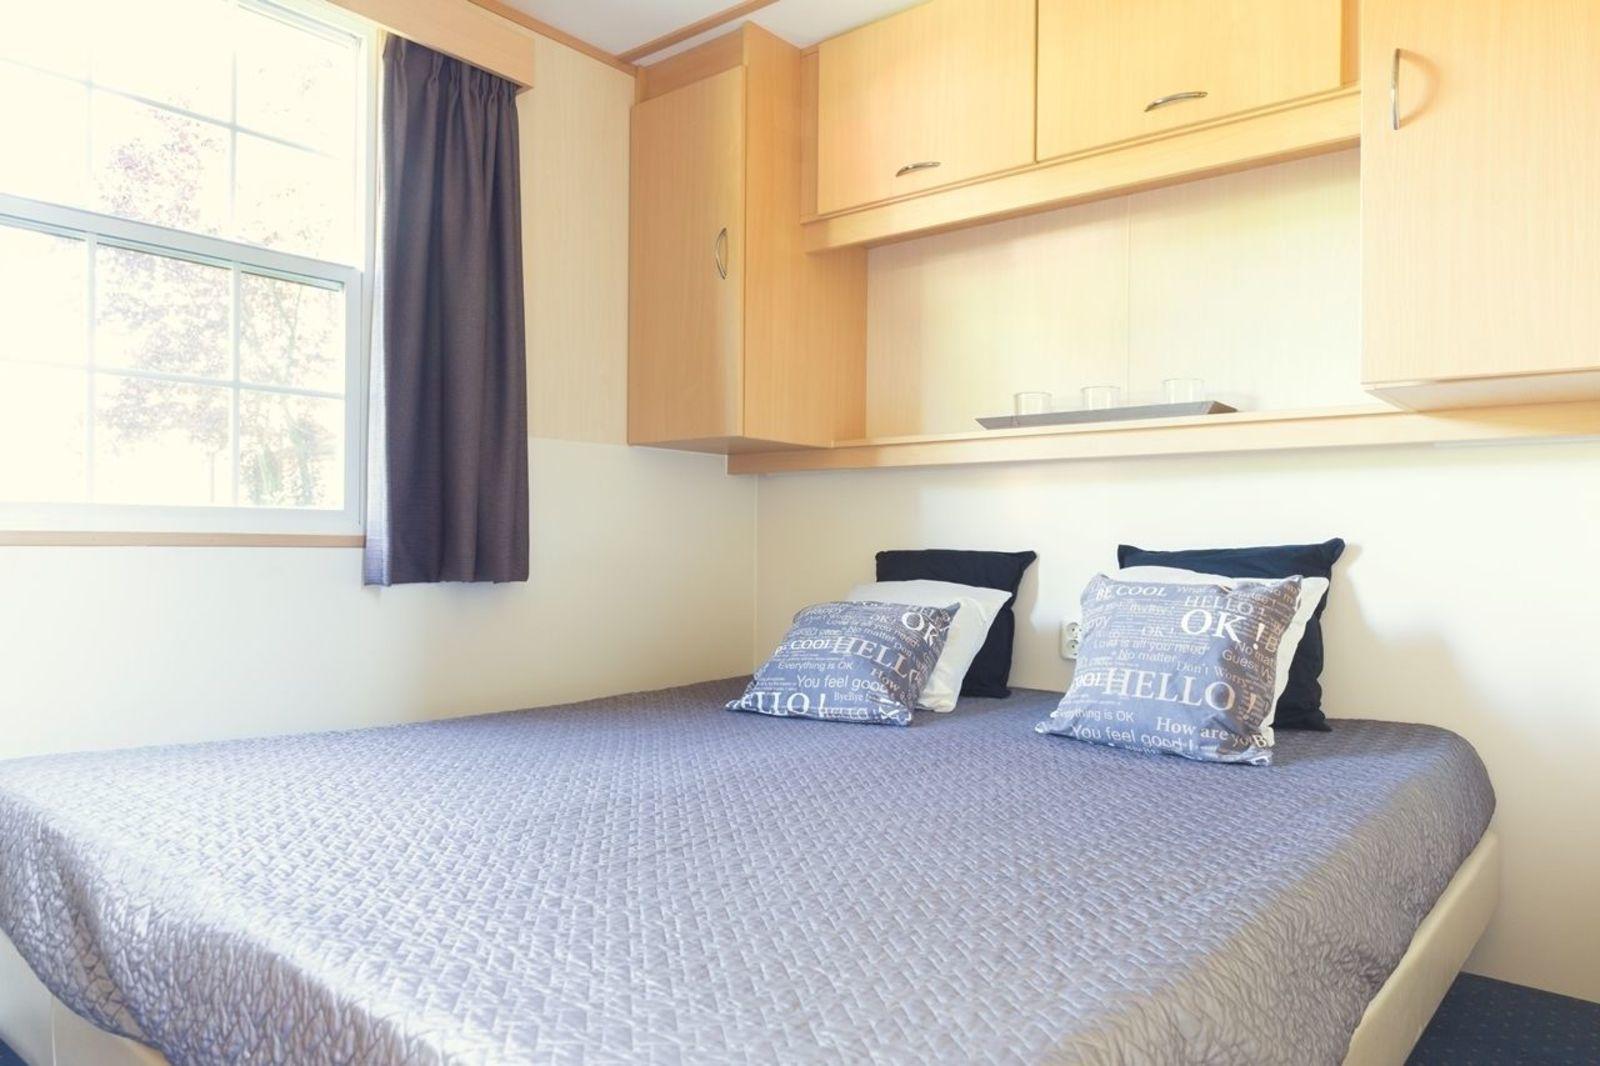 Bungalette 6 personen basis | 2 slaapkamers